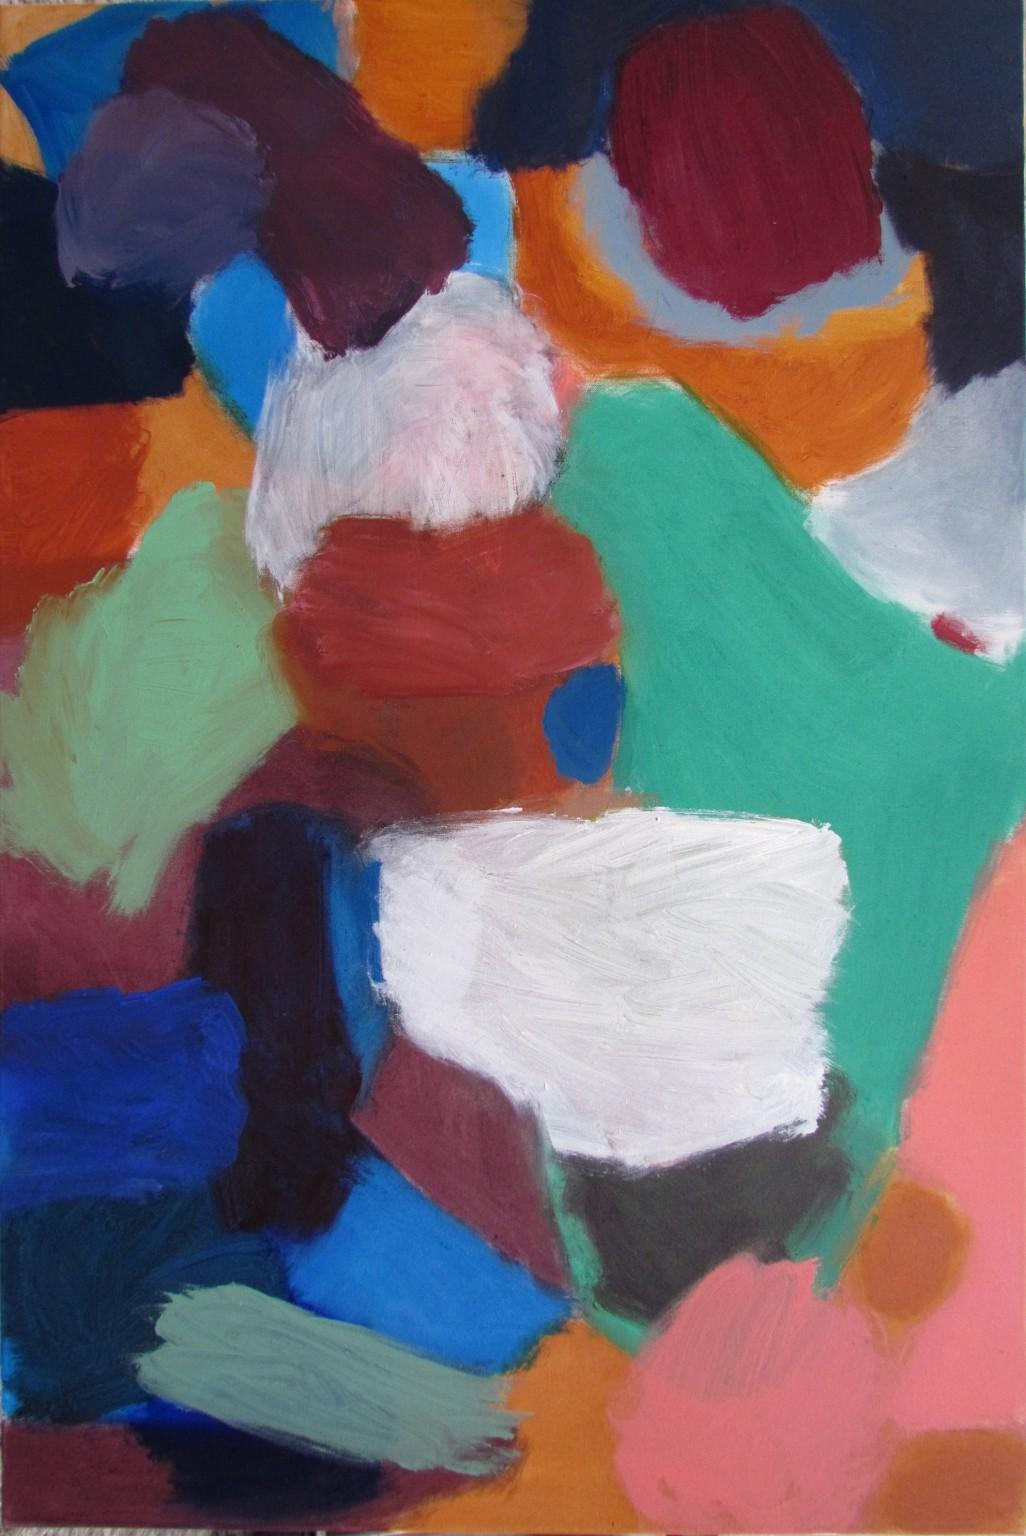 Hilde Skilton, Brancaster Bunch, 2013, oil on canvas, 120 x 80 cm (courtesy of t